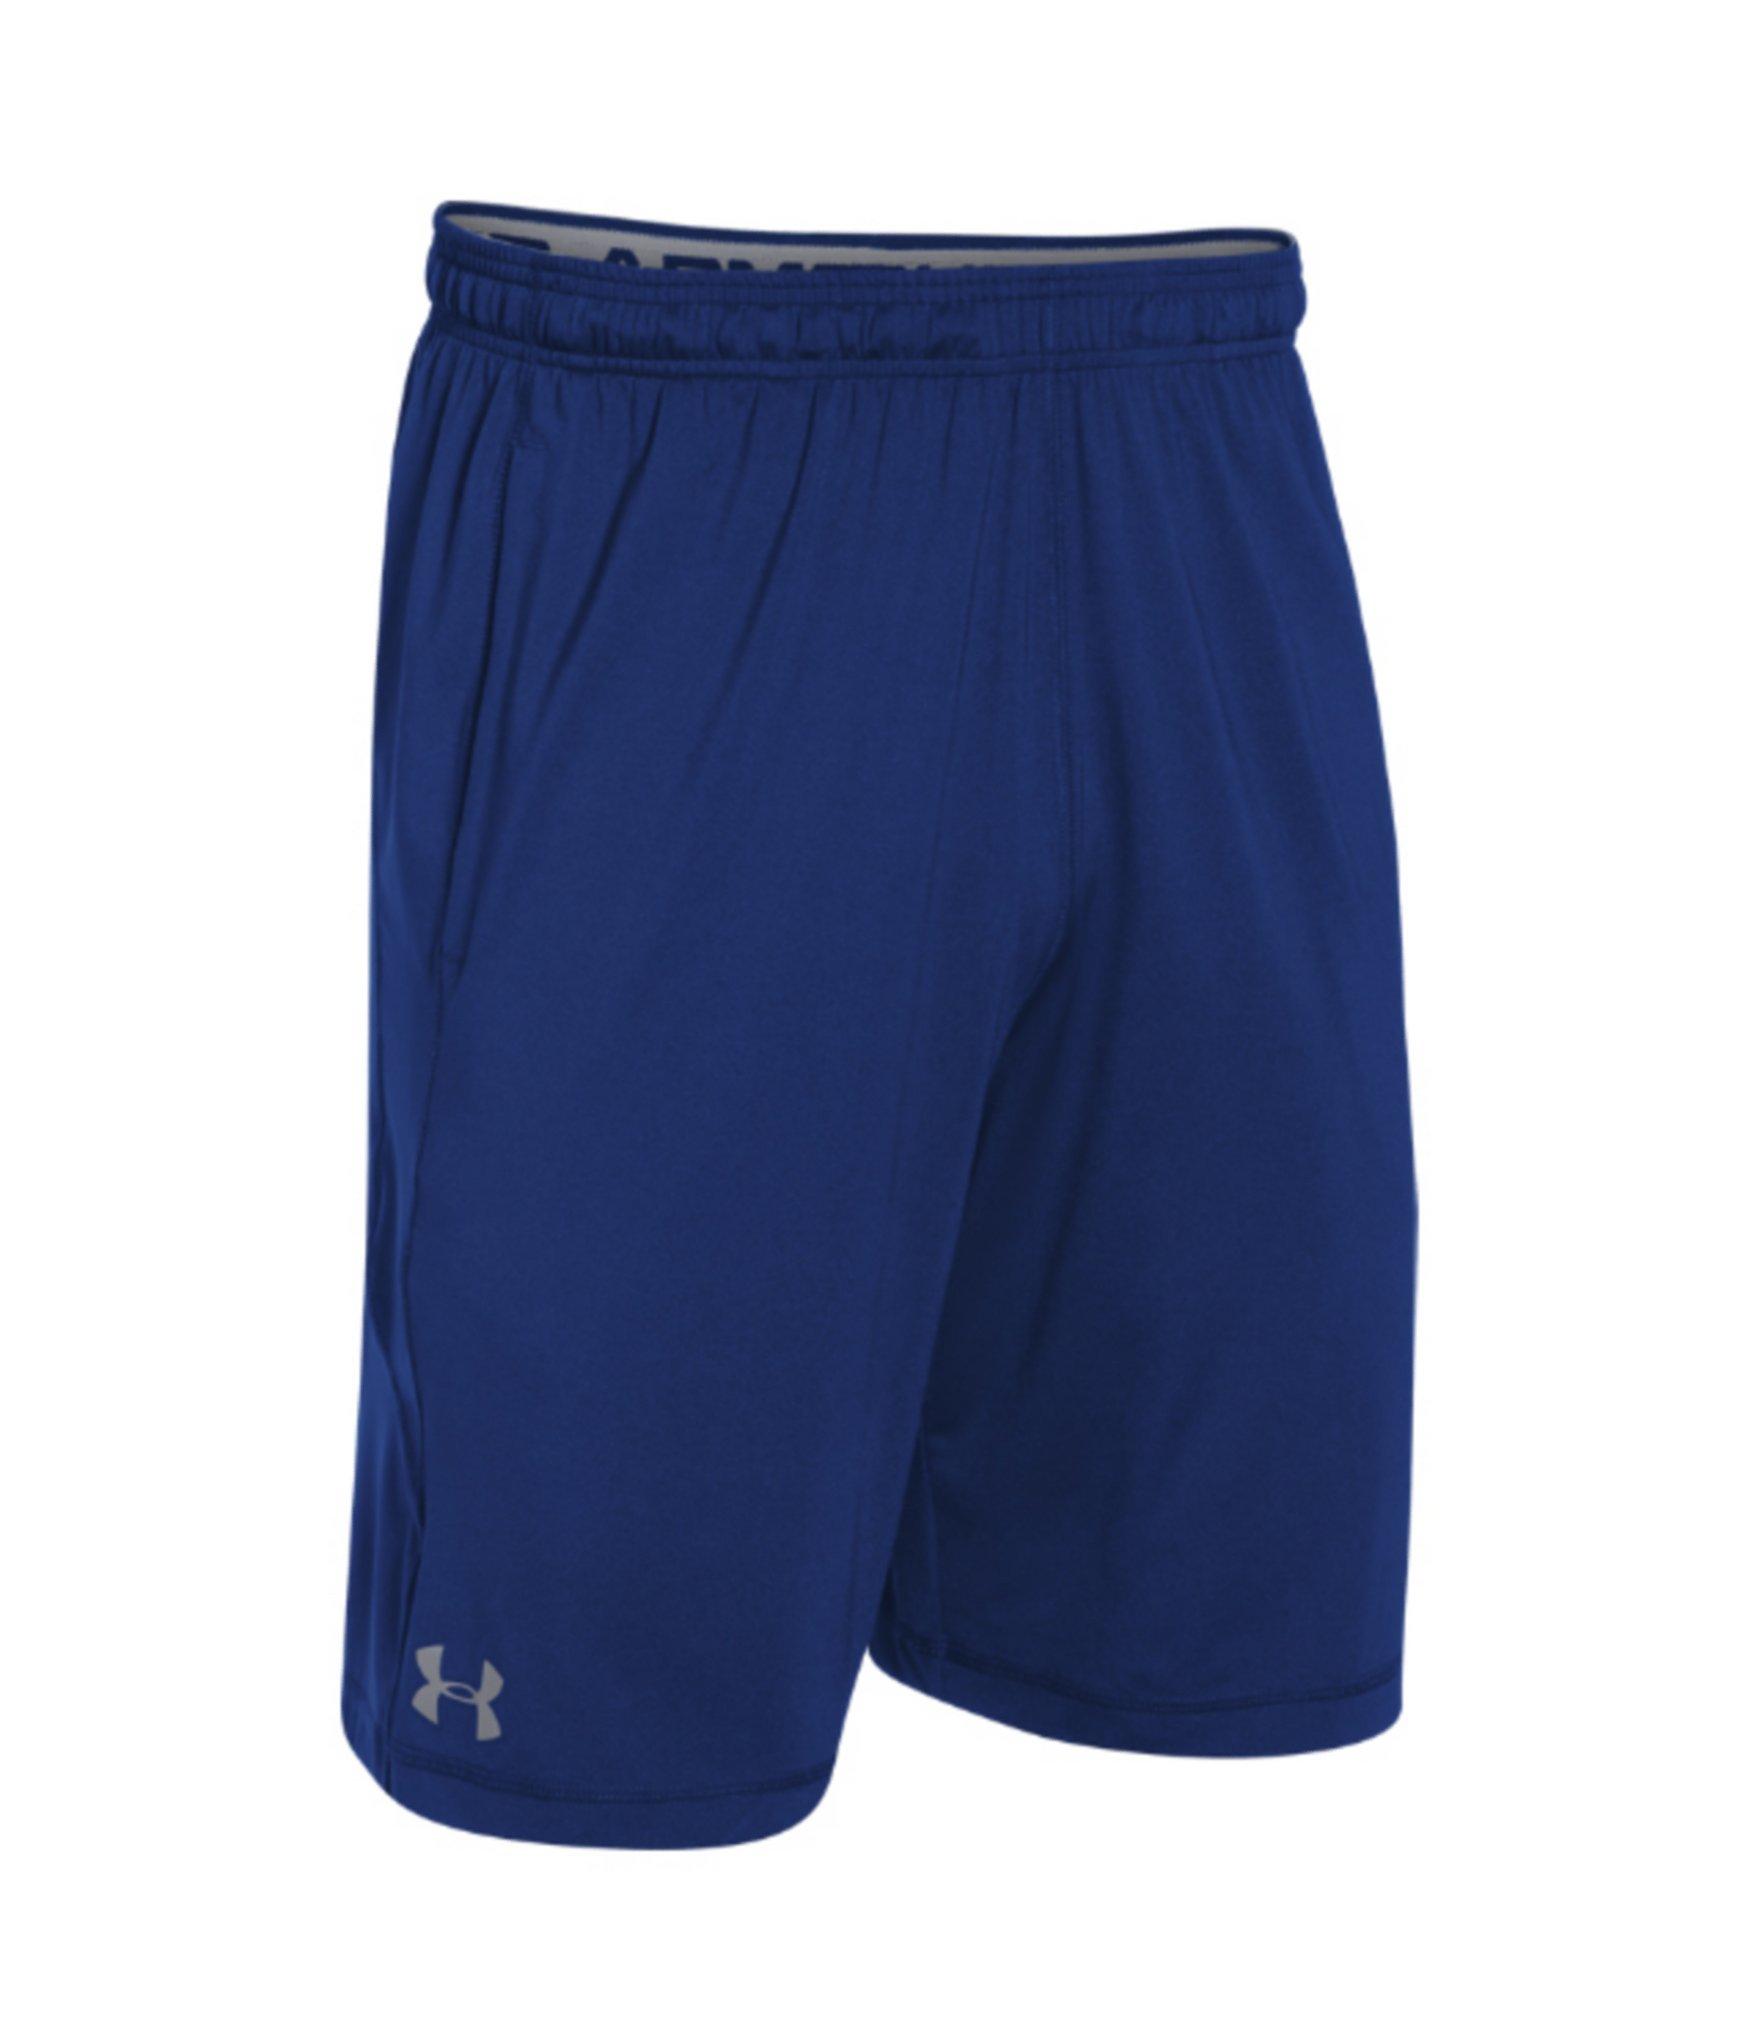 Under armour Ua Raid Shorts in Blue for Men